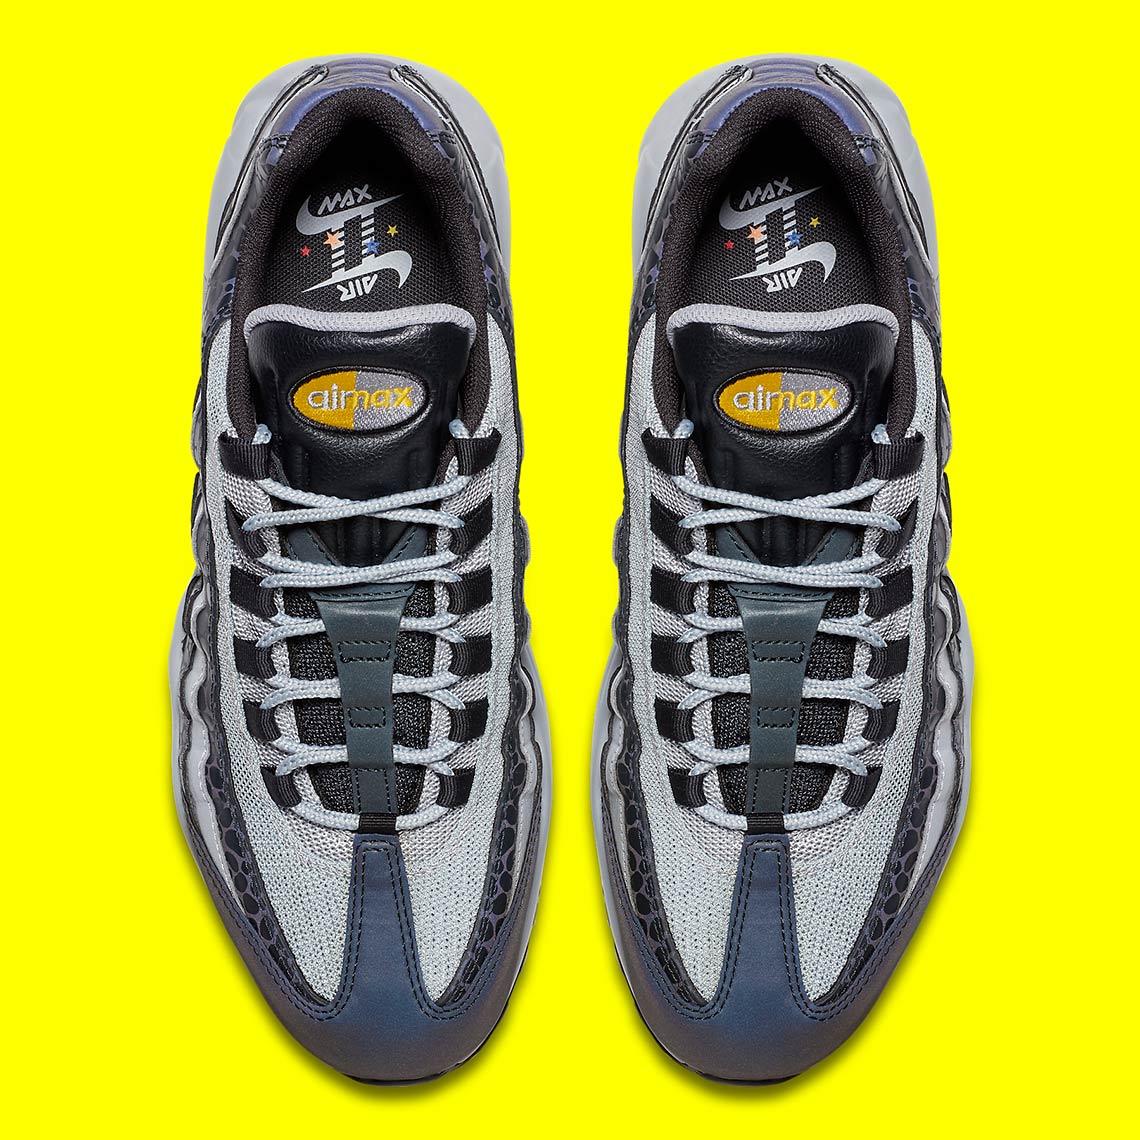 Nike Air Max 95 Safari BQ6523 001 Release Date |